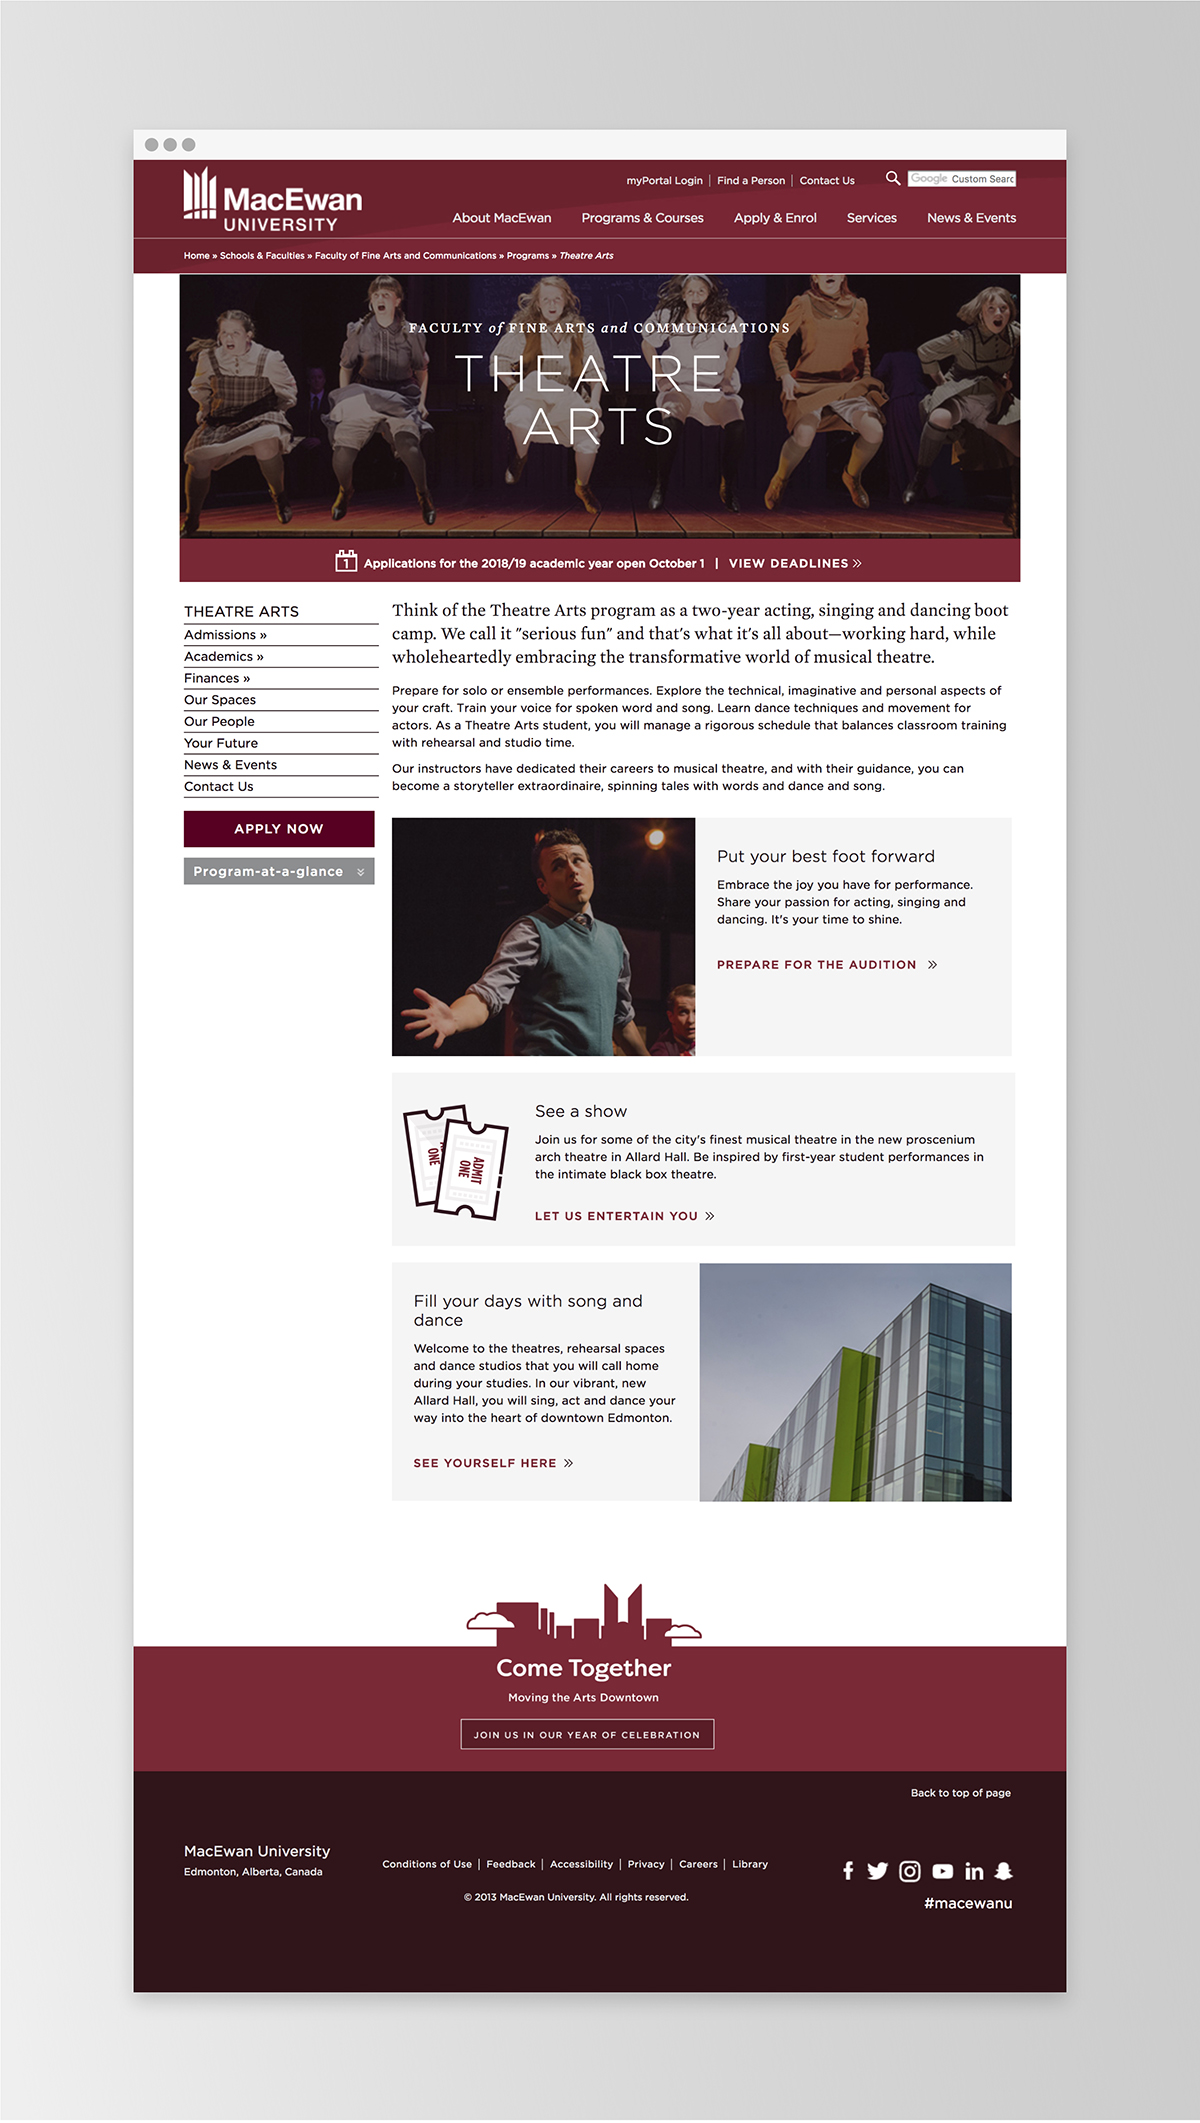 An example of the new MacEwan site template   MacEwan.ca/TheatreArts